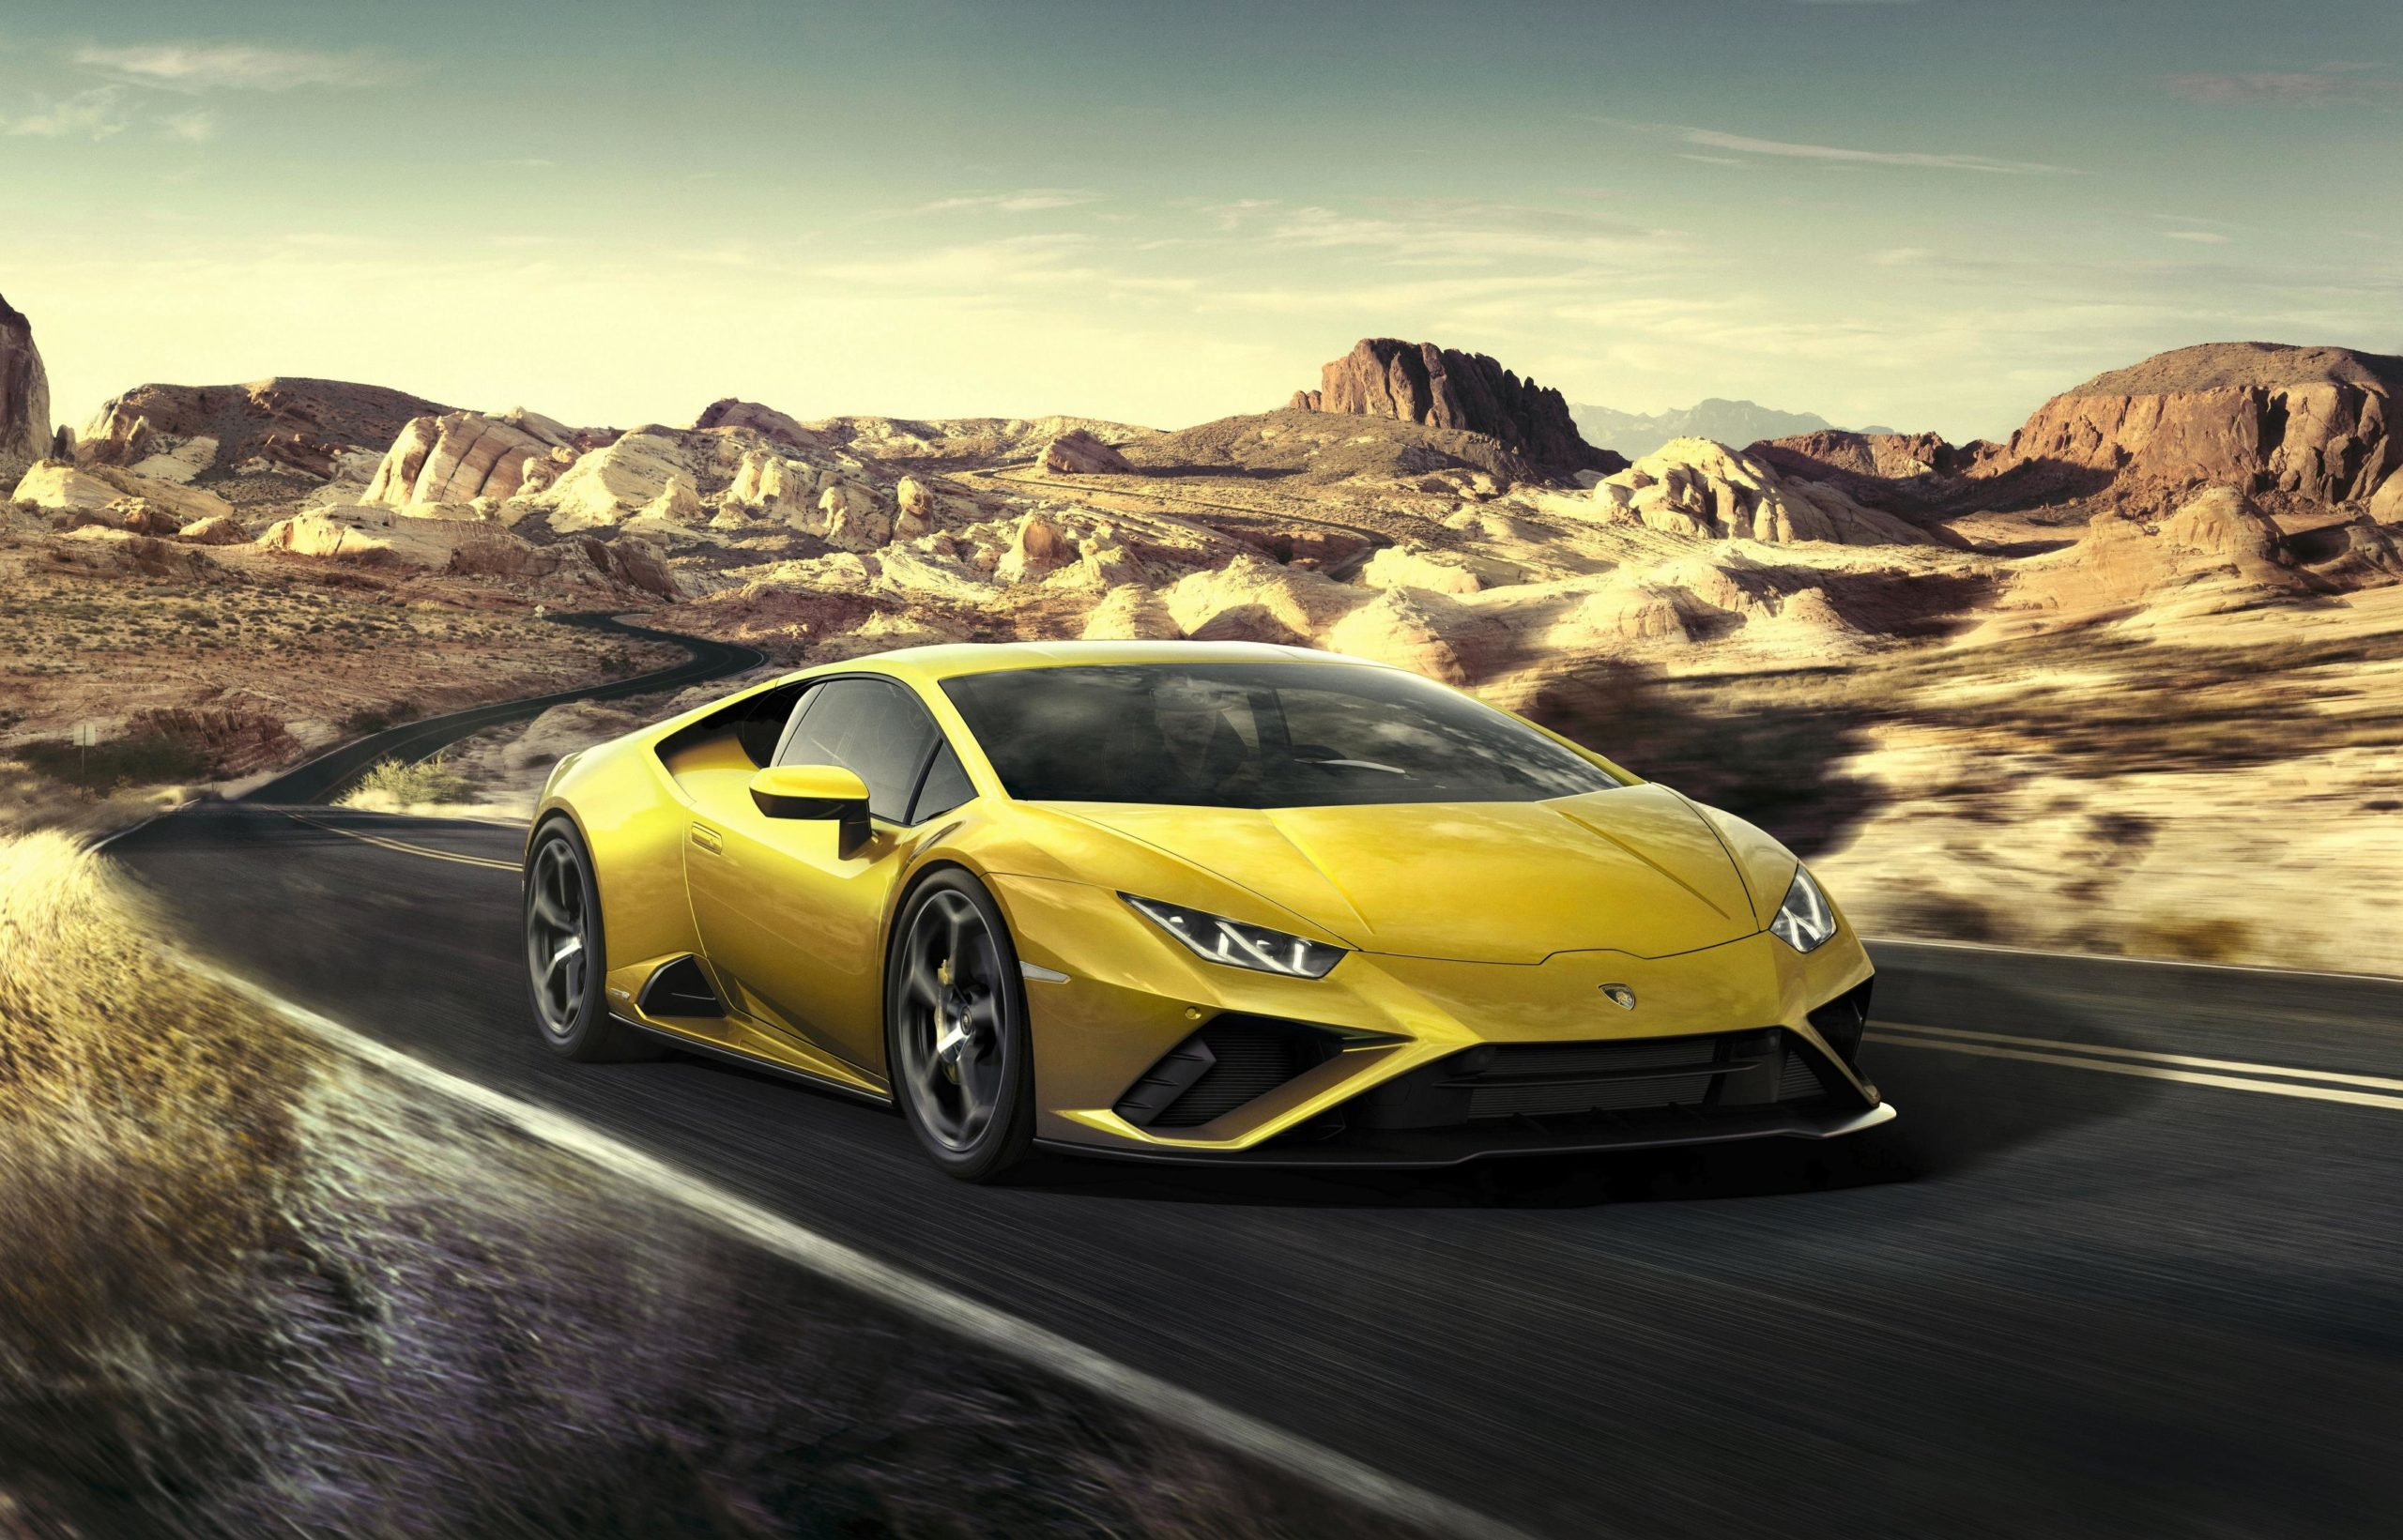 Lamborghini es el primer fabricante que incorpora Alexa